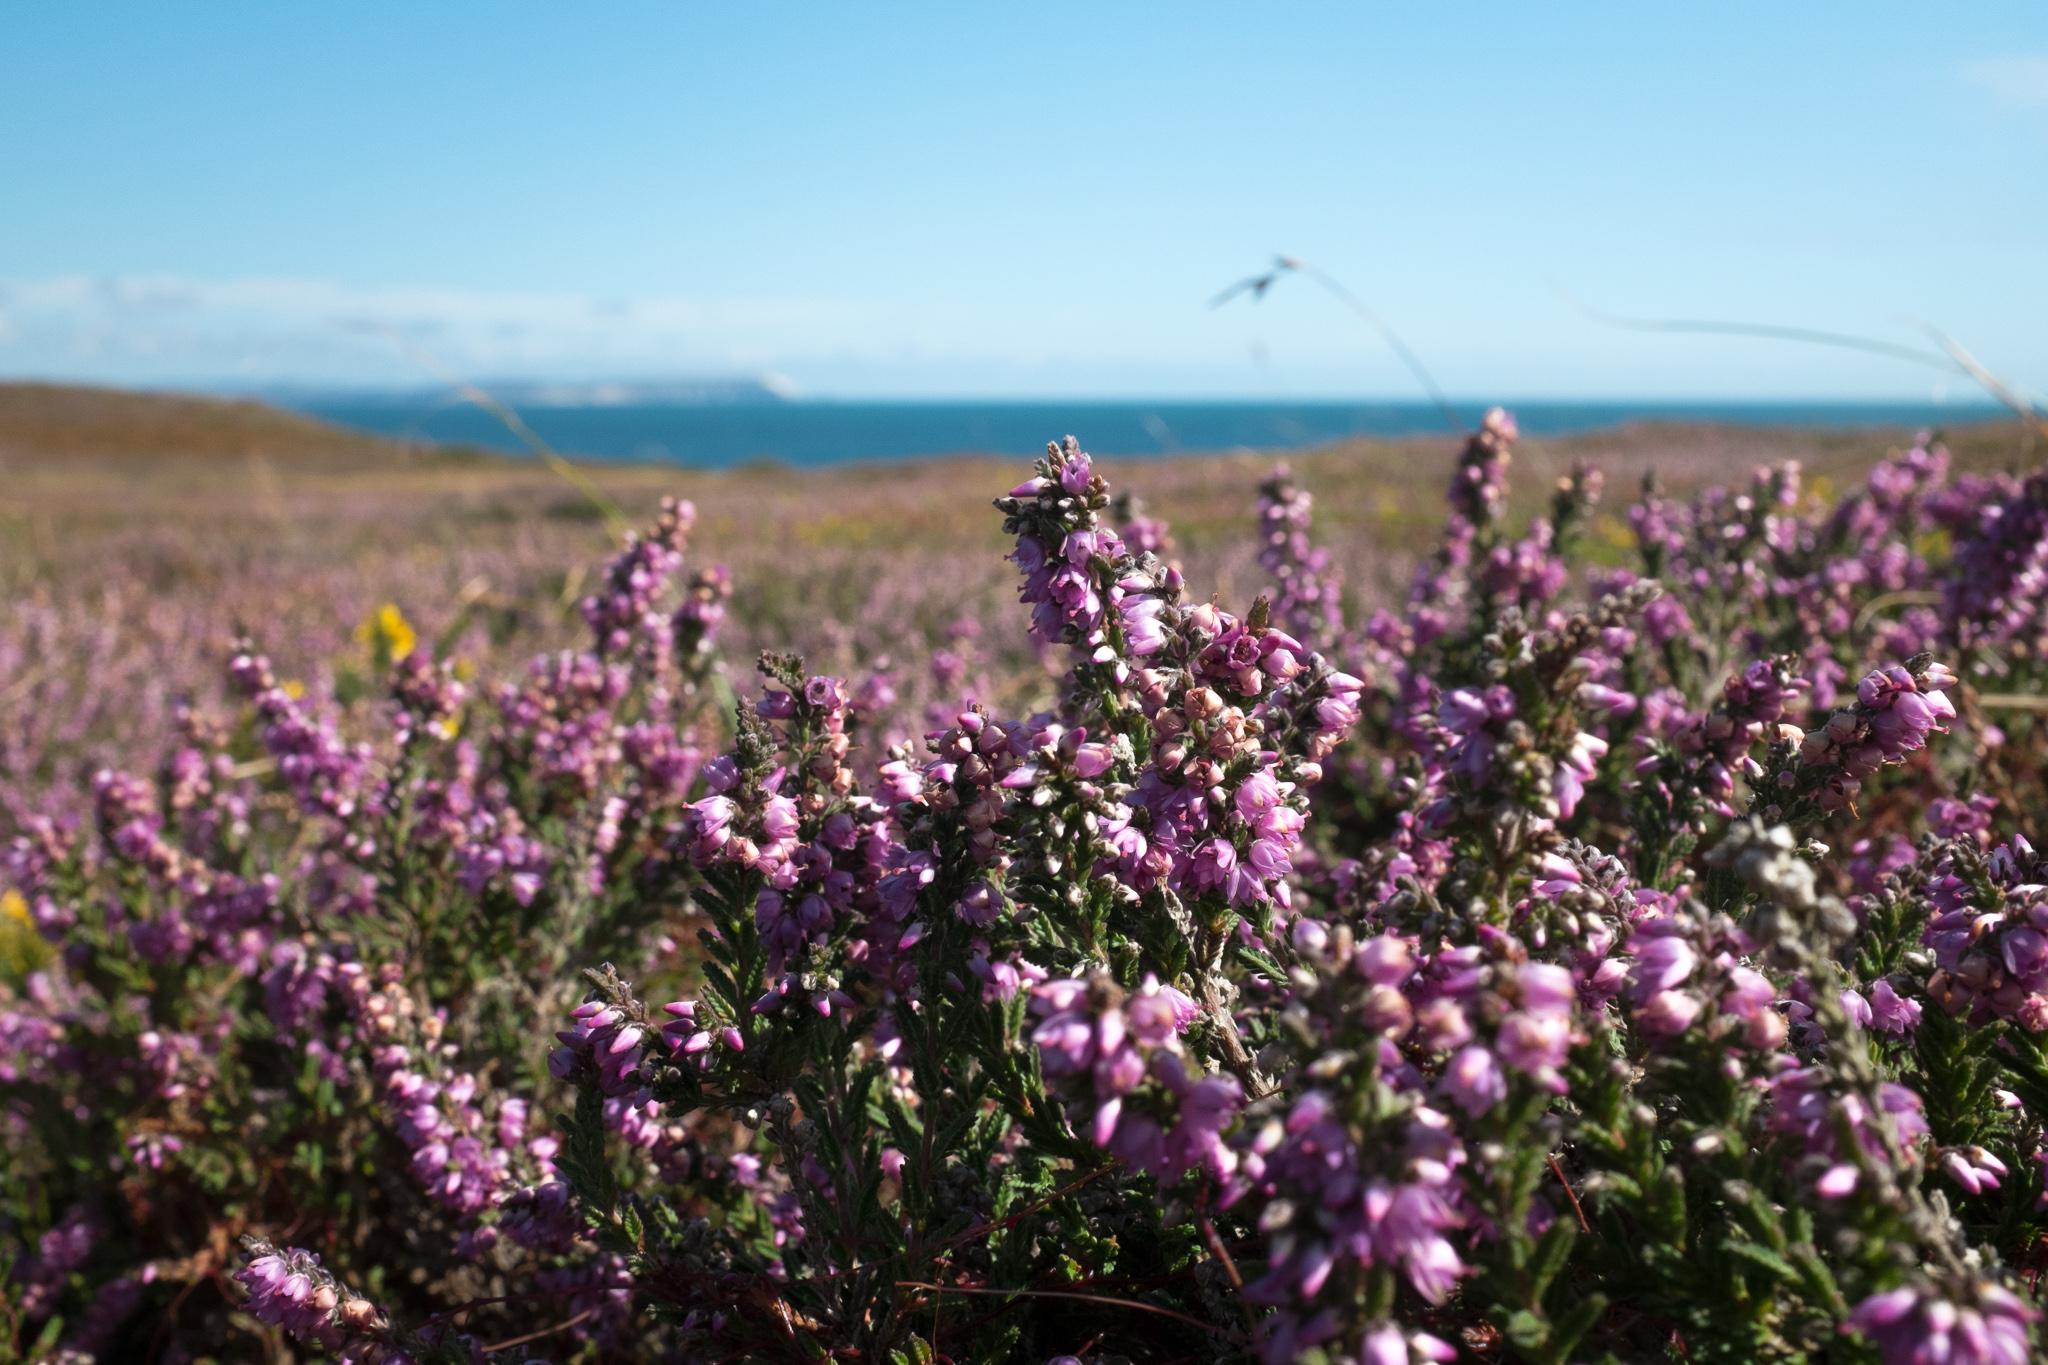 4866-nature-lymington-bournemouth-coast.jpg